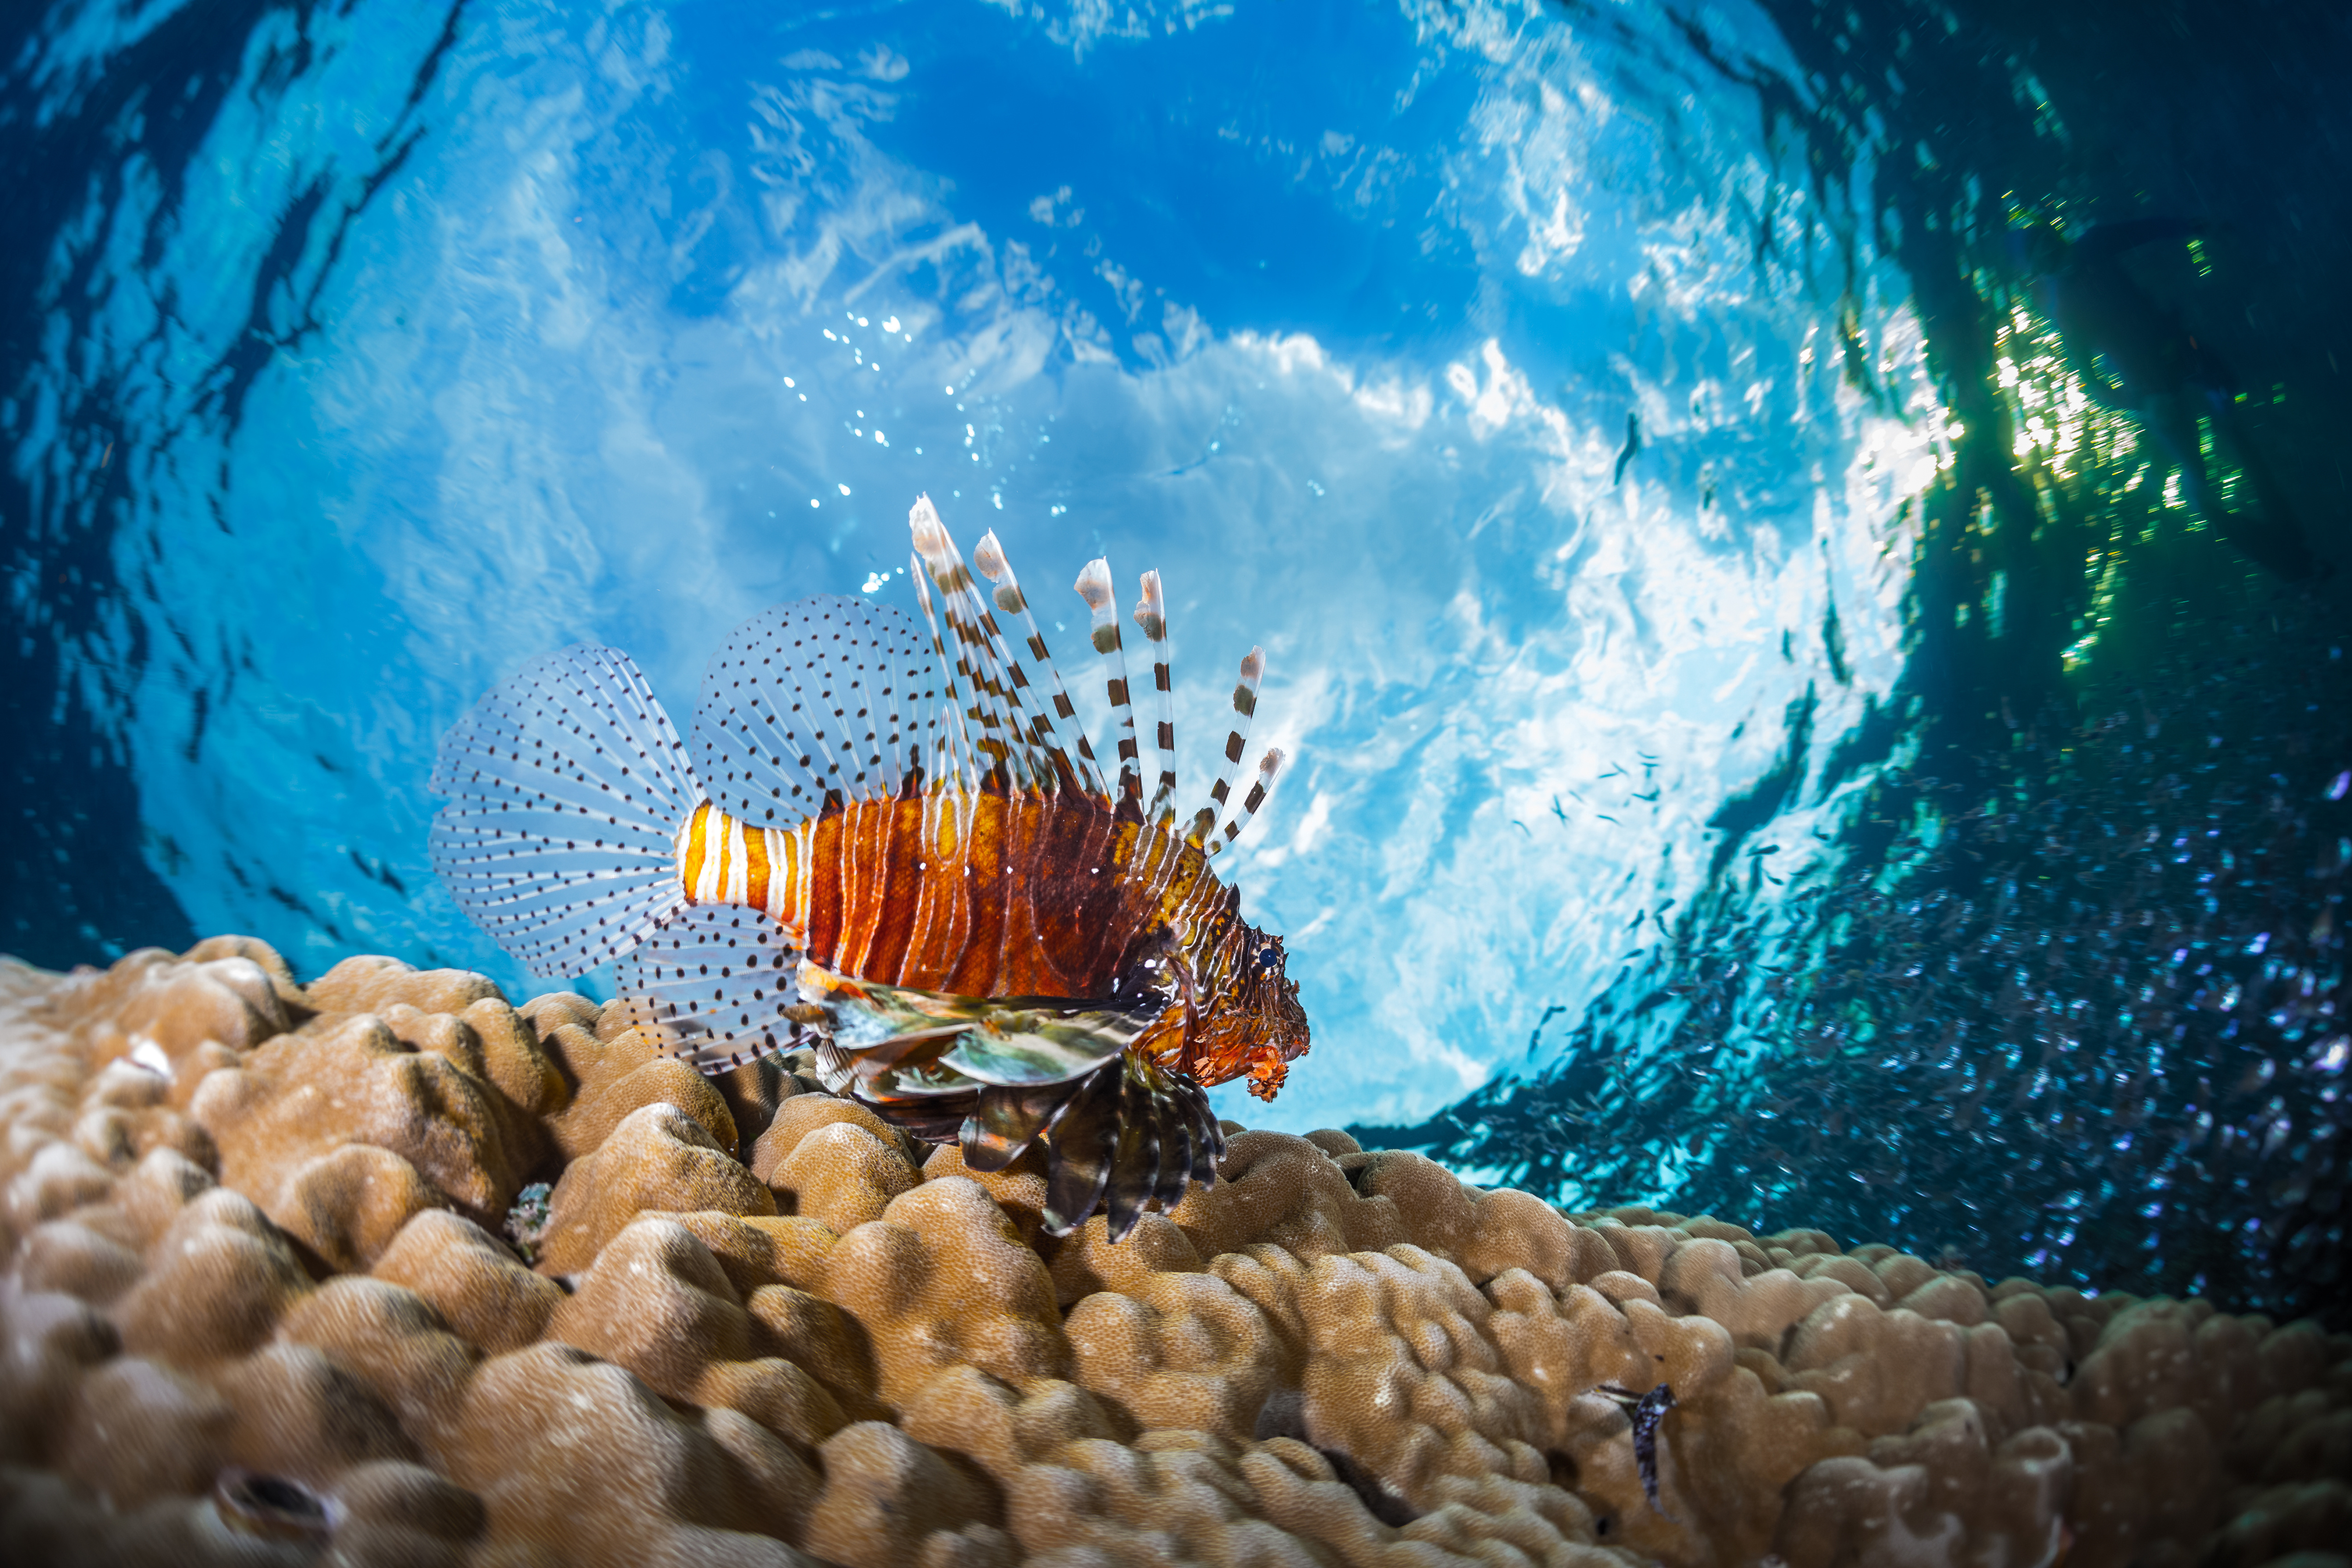 Lion fish underwater shot against blue sky background